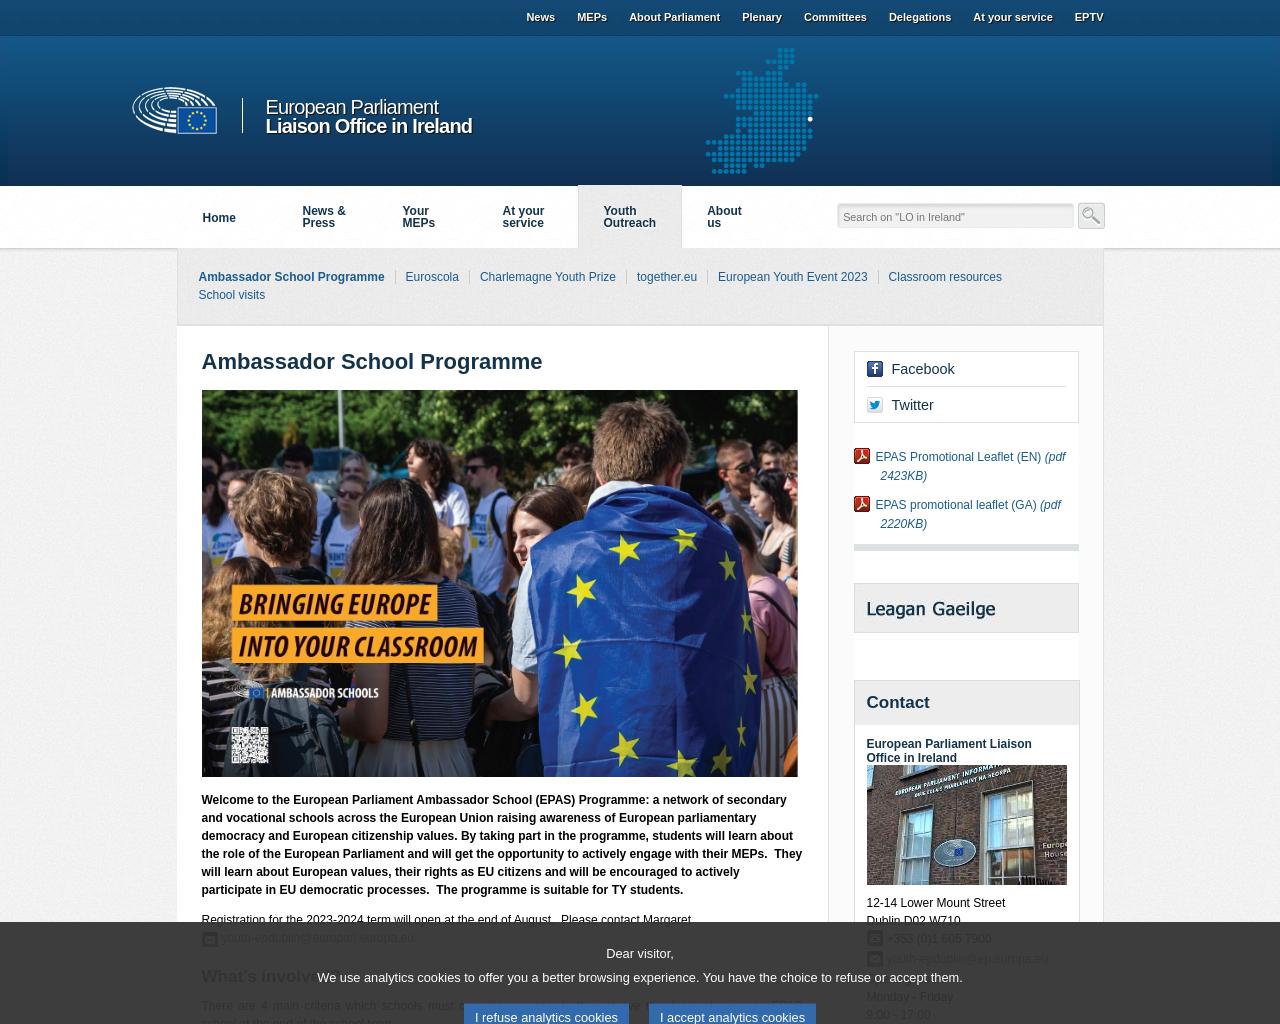 European Ambassador Schools Programme